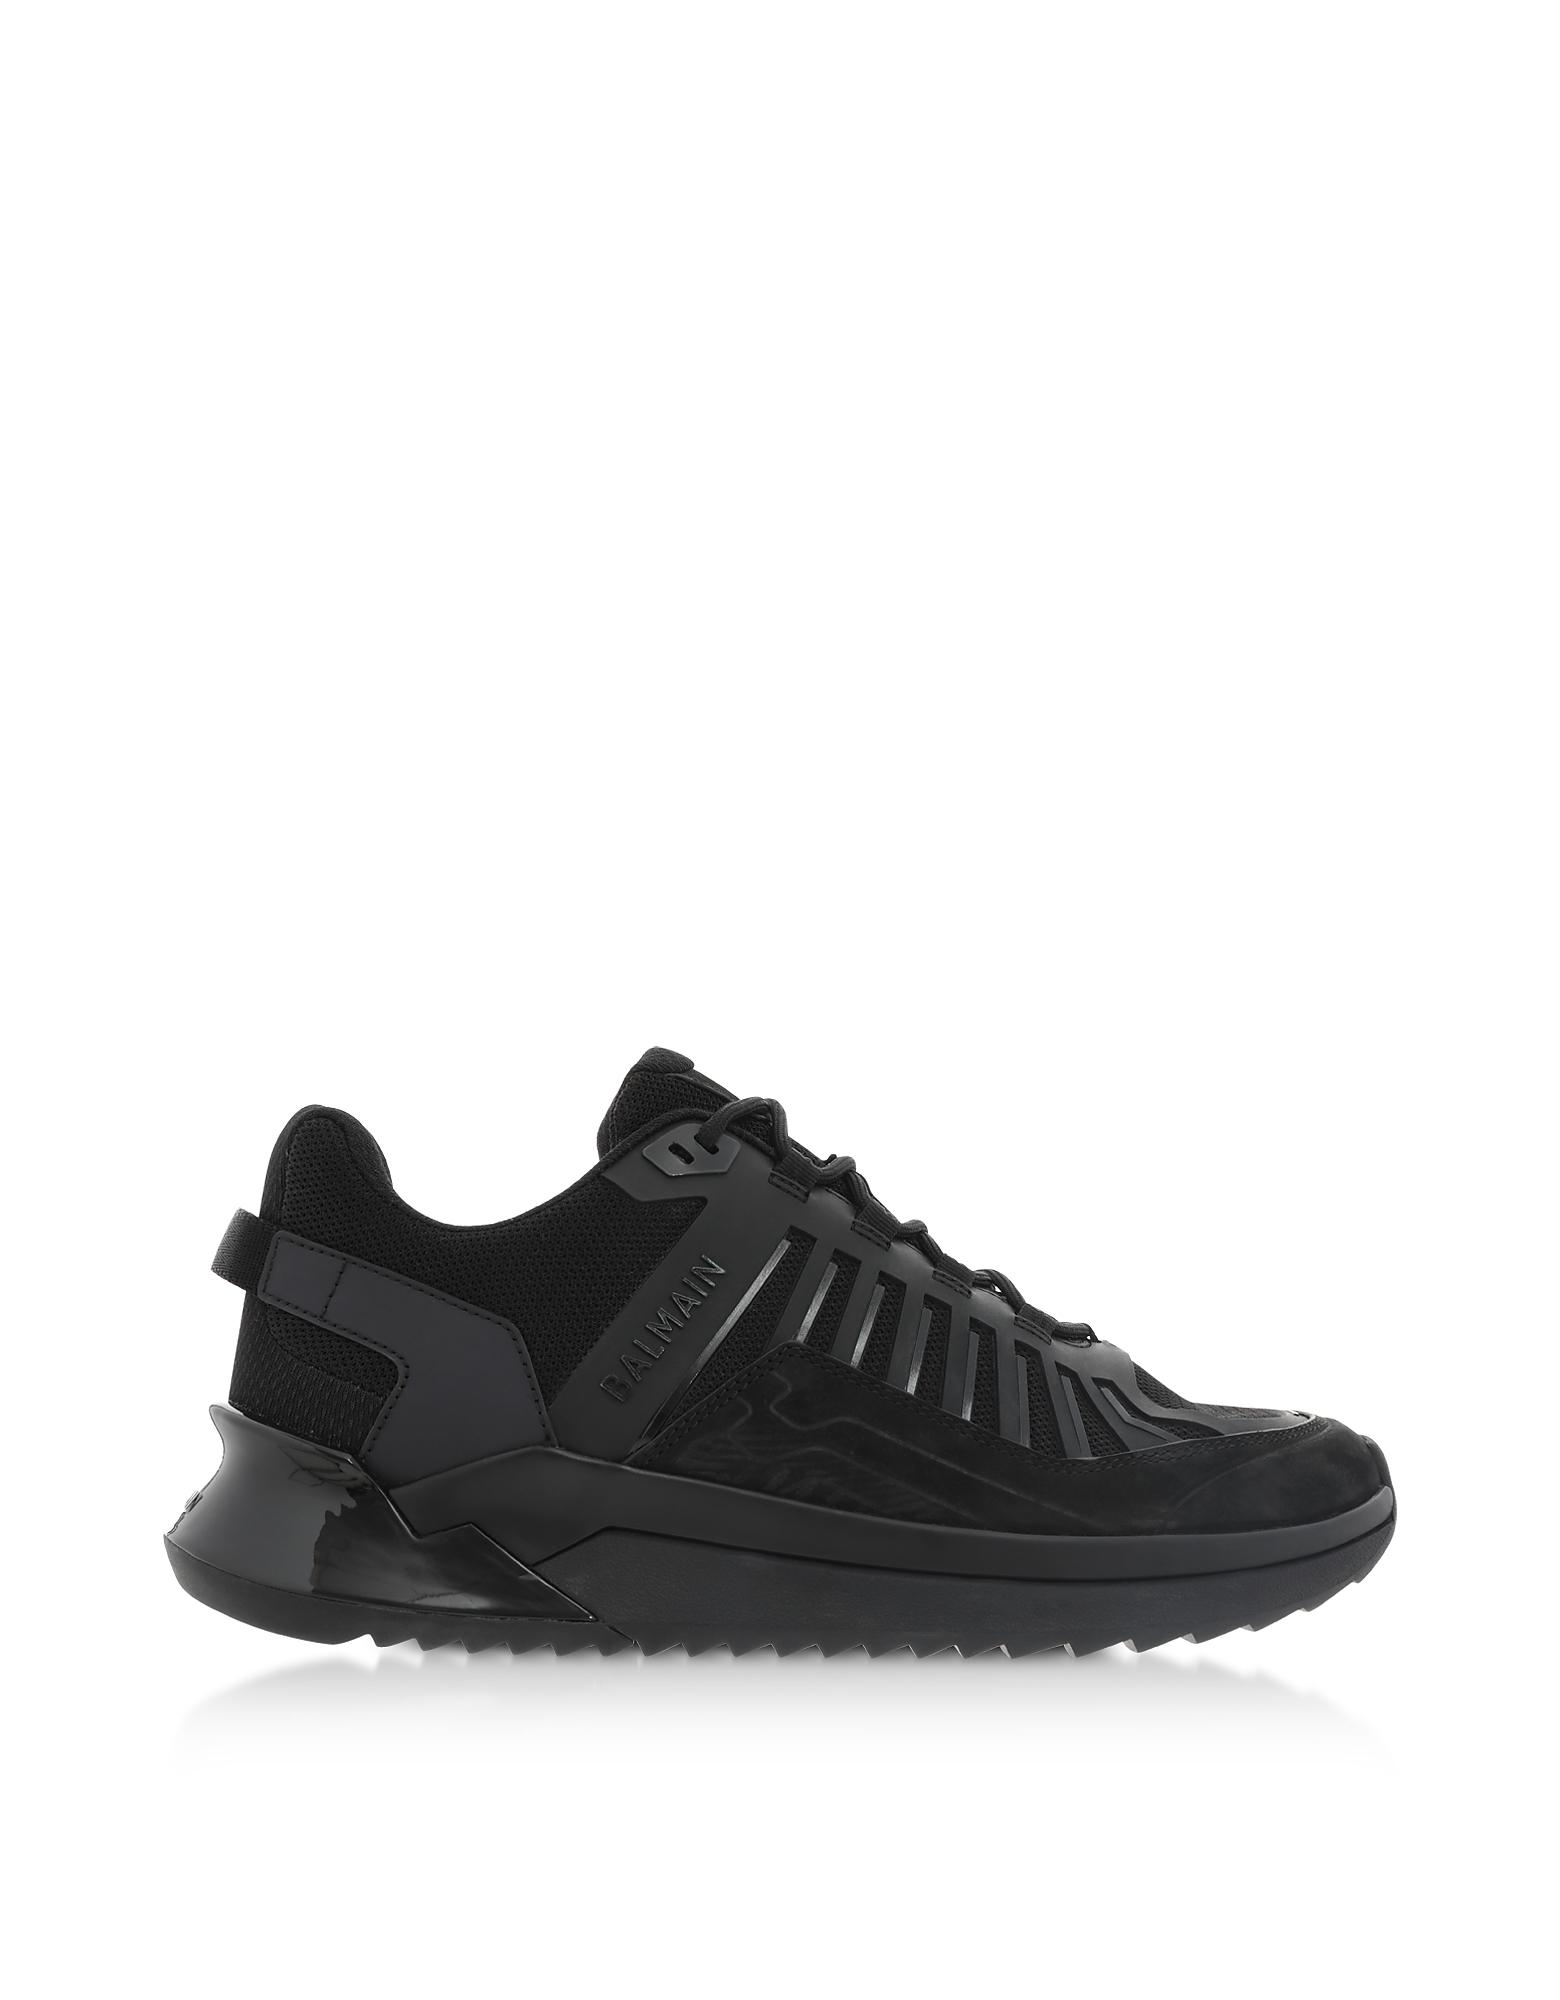 Black Mid Top Men's B-Trail Sneakers